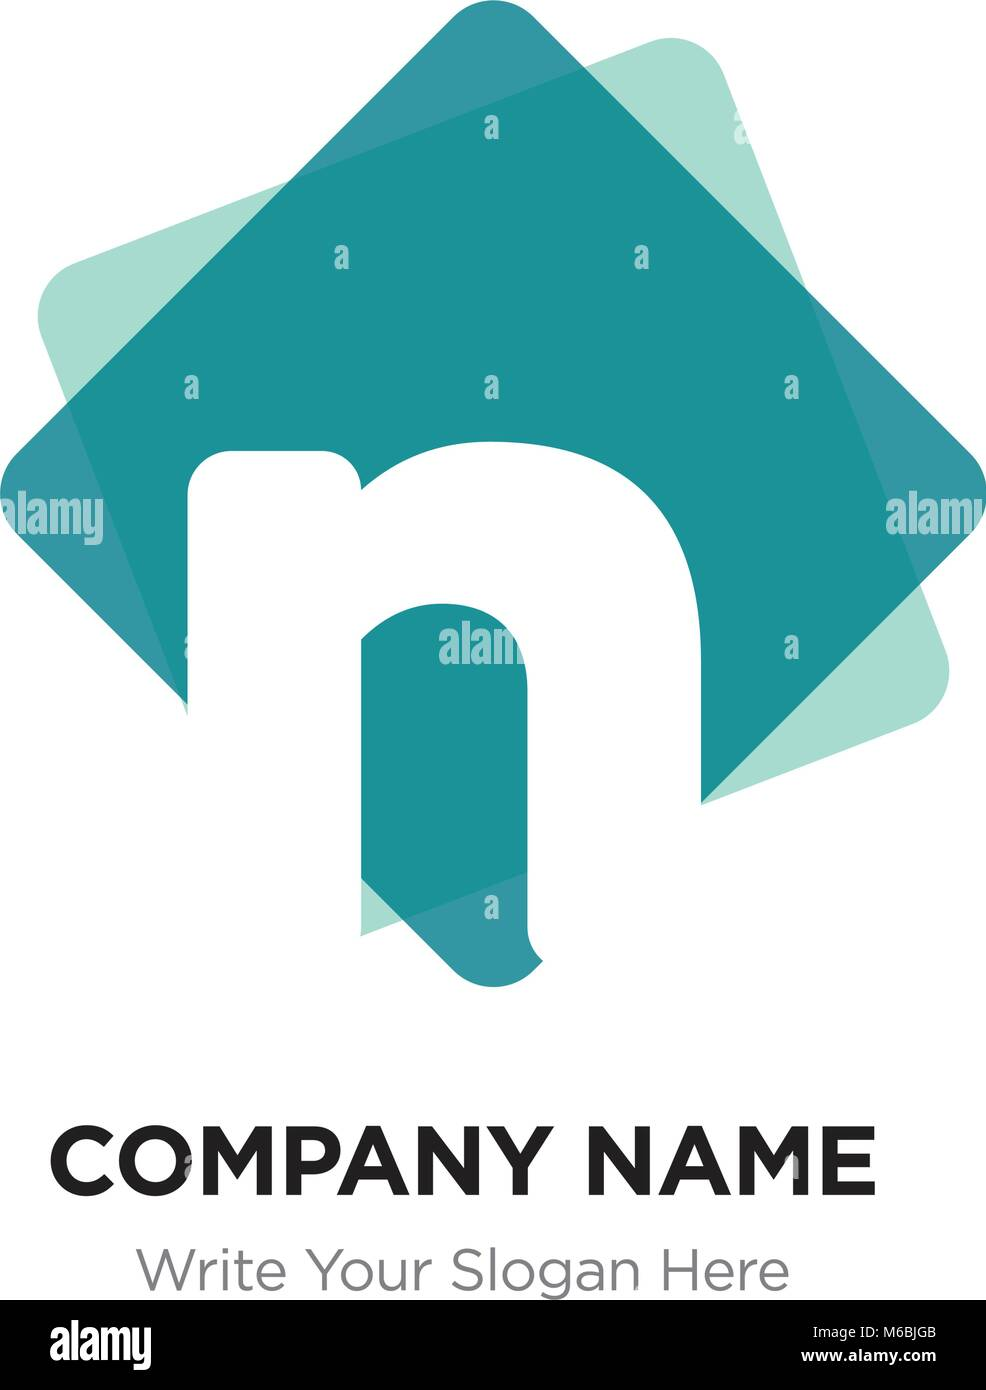 Abstract letter n logo design template white vector icon on green abstract letter n logo design template white vector icon on green background maxwellsz